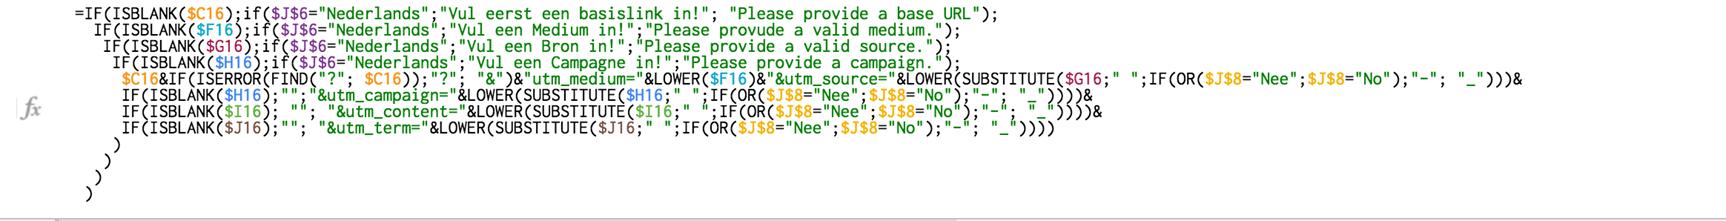 url-builder-function